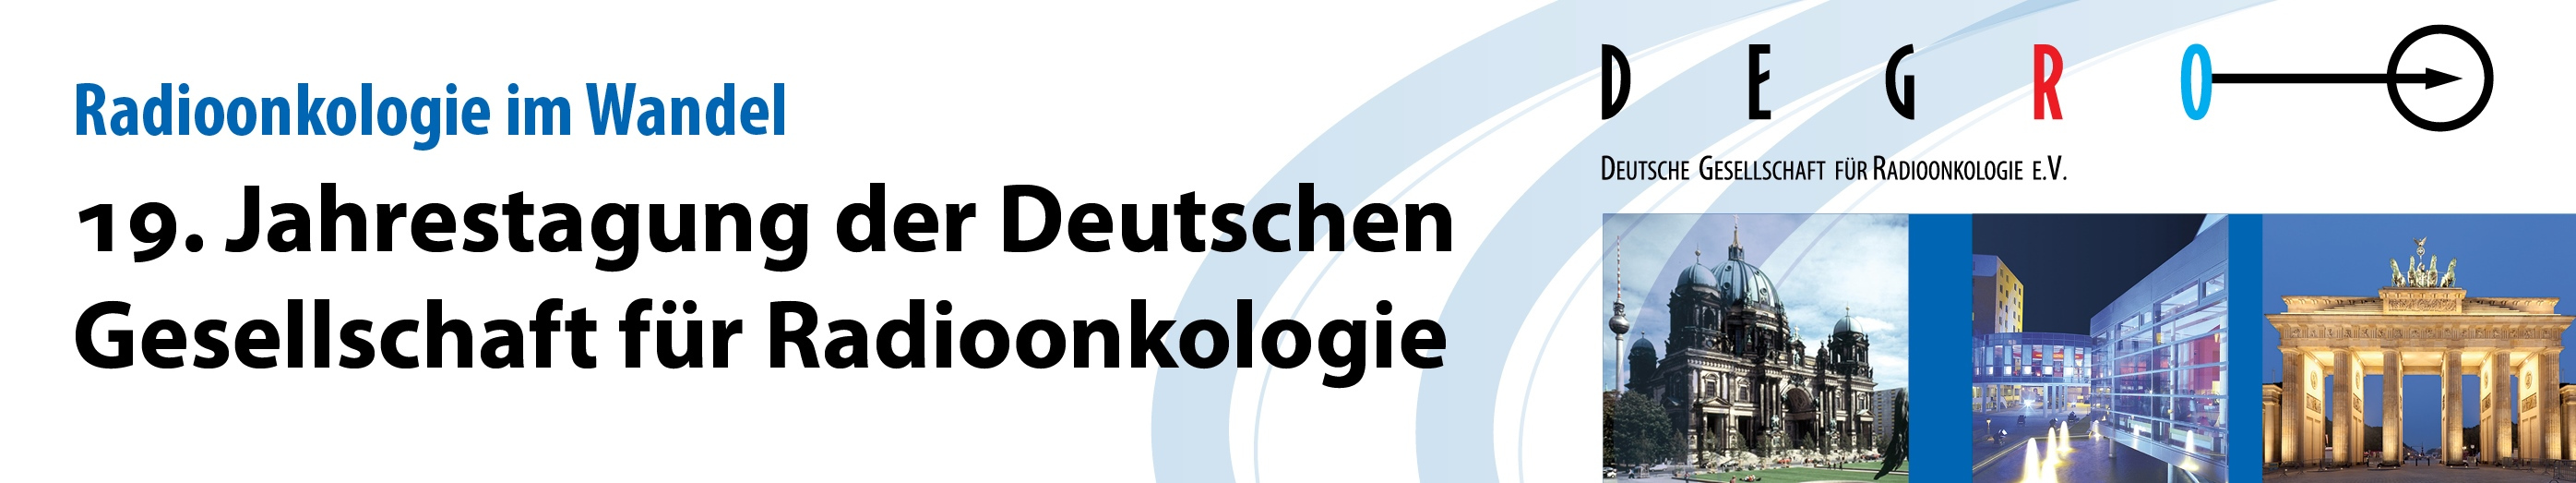 Degro 2013 Radioonkologie im Wandel